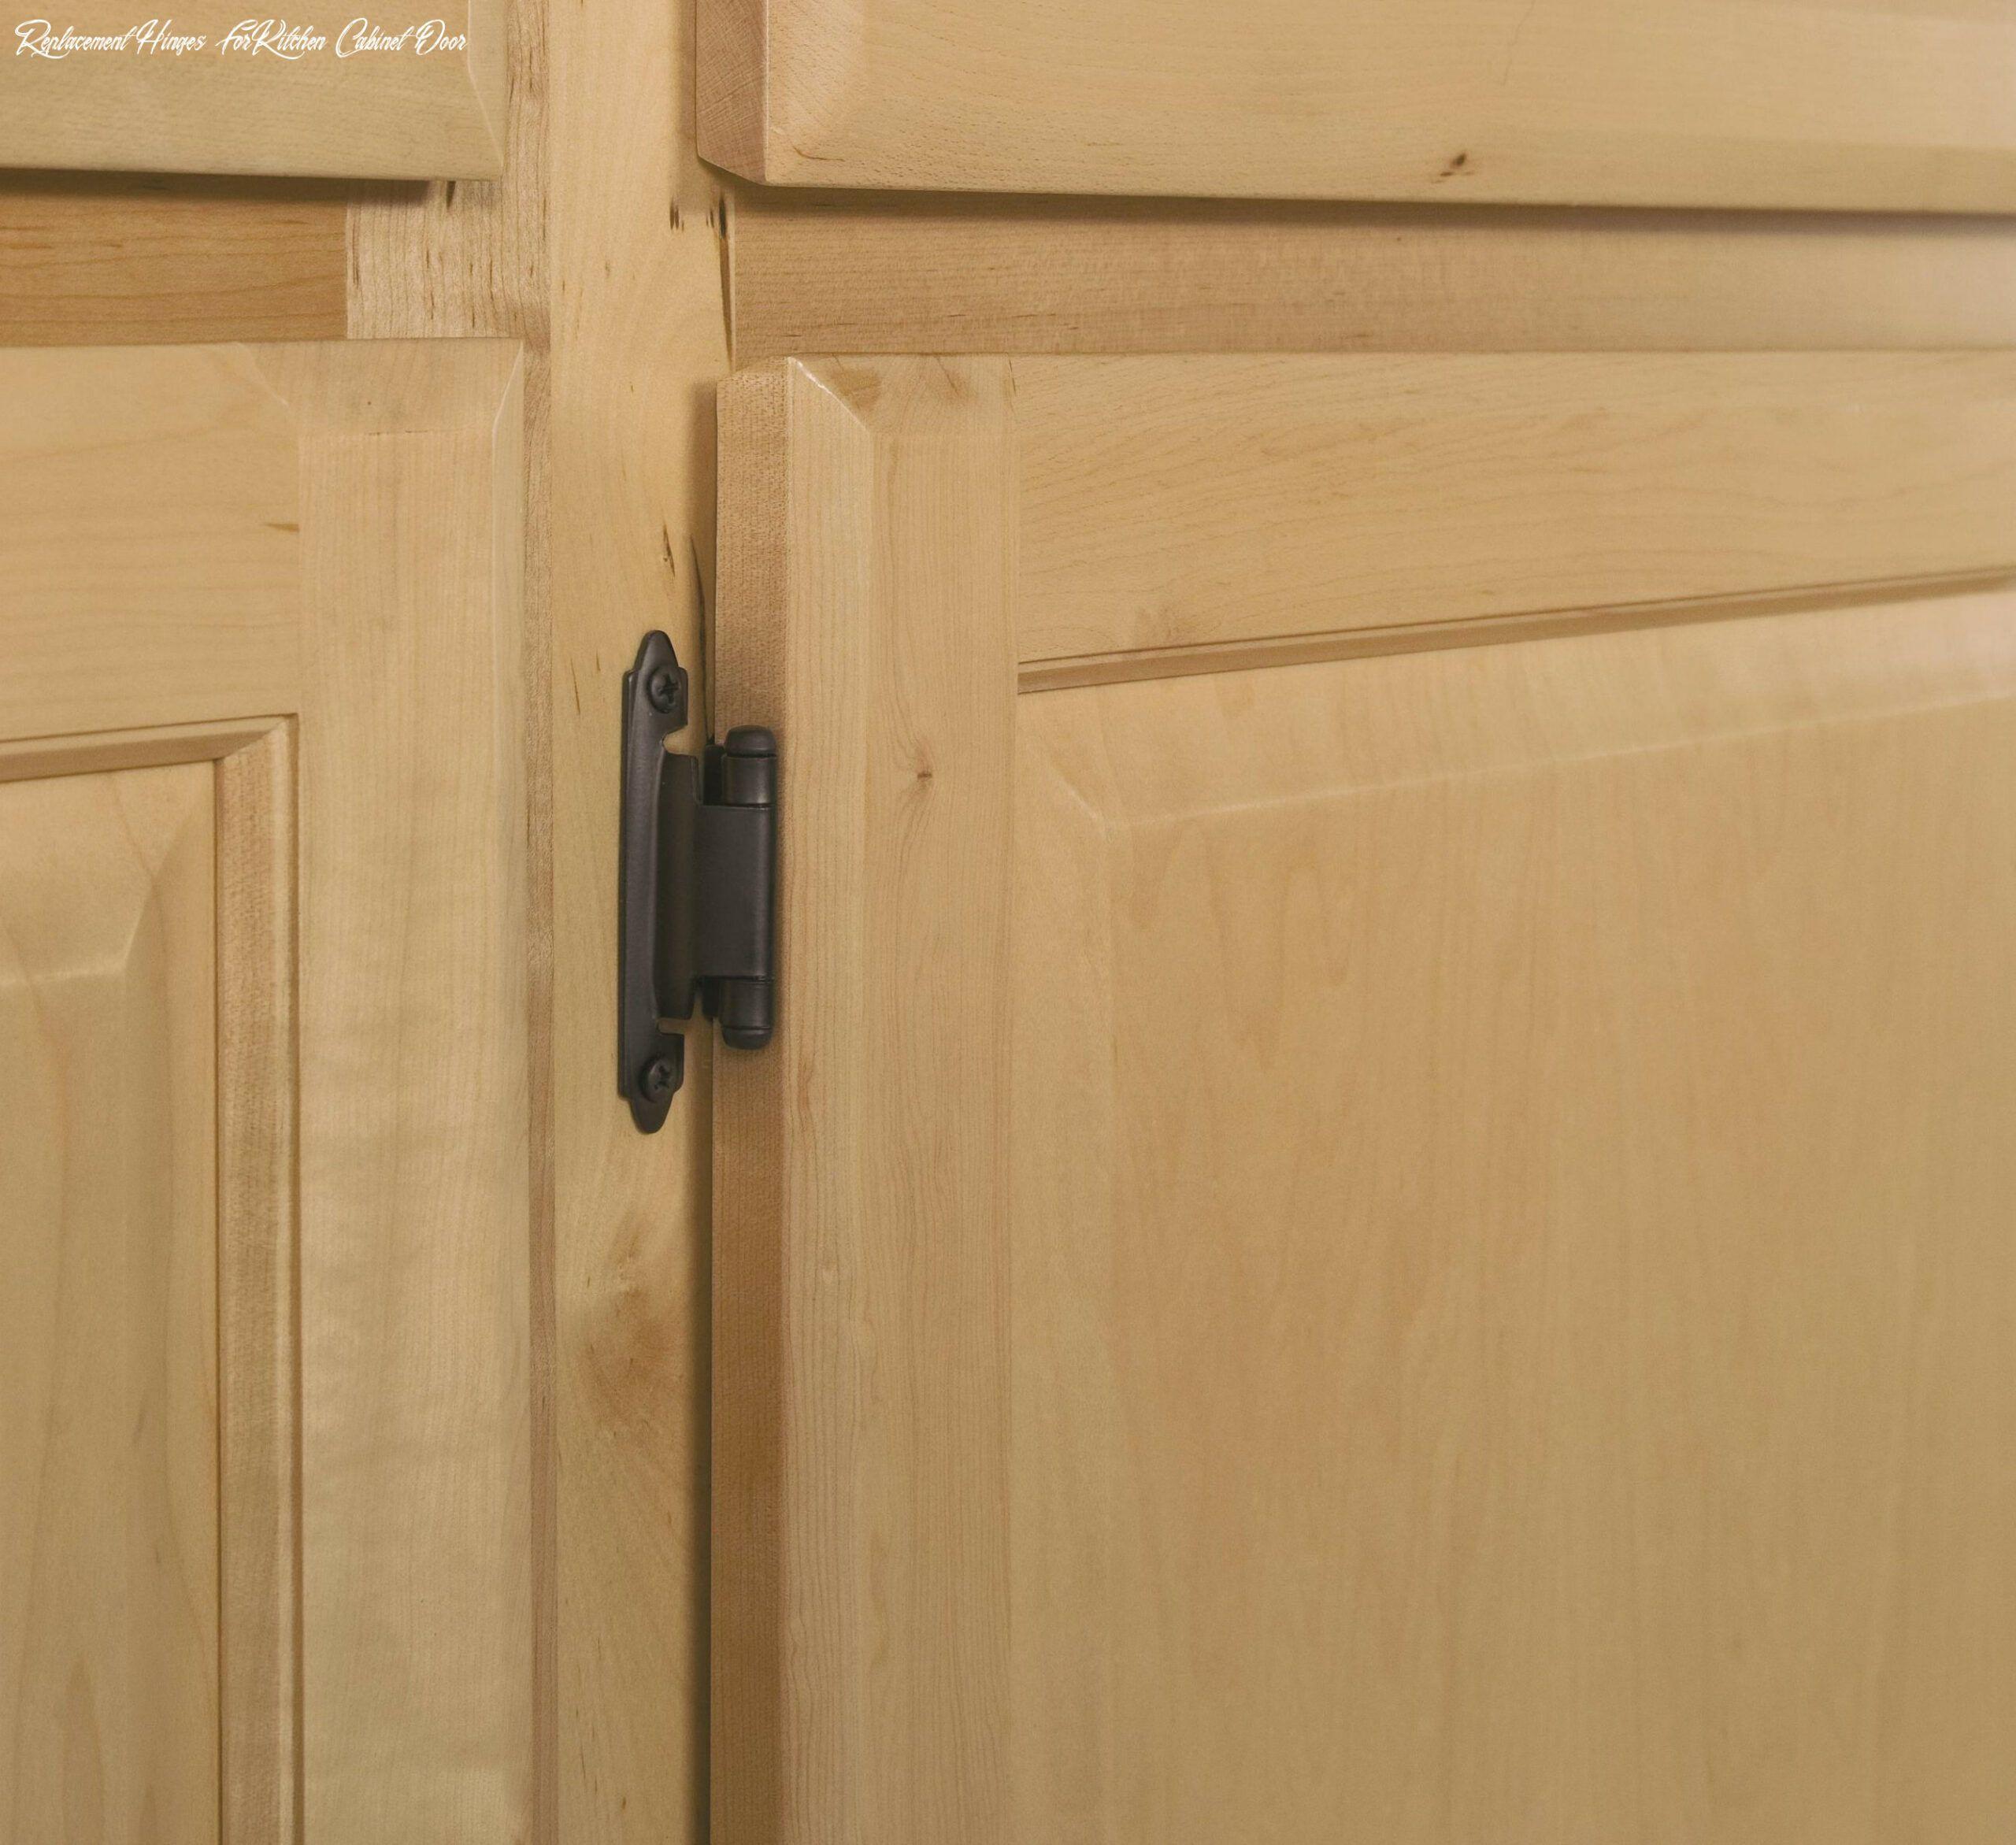 Replacement Hinges For Kitchen Cabinet Door In 2020 Hinges For Cabinets Kitchen Cabinets Door Hinges Kitchen Cabinets Hinges